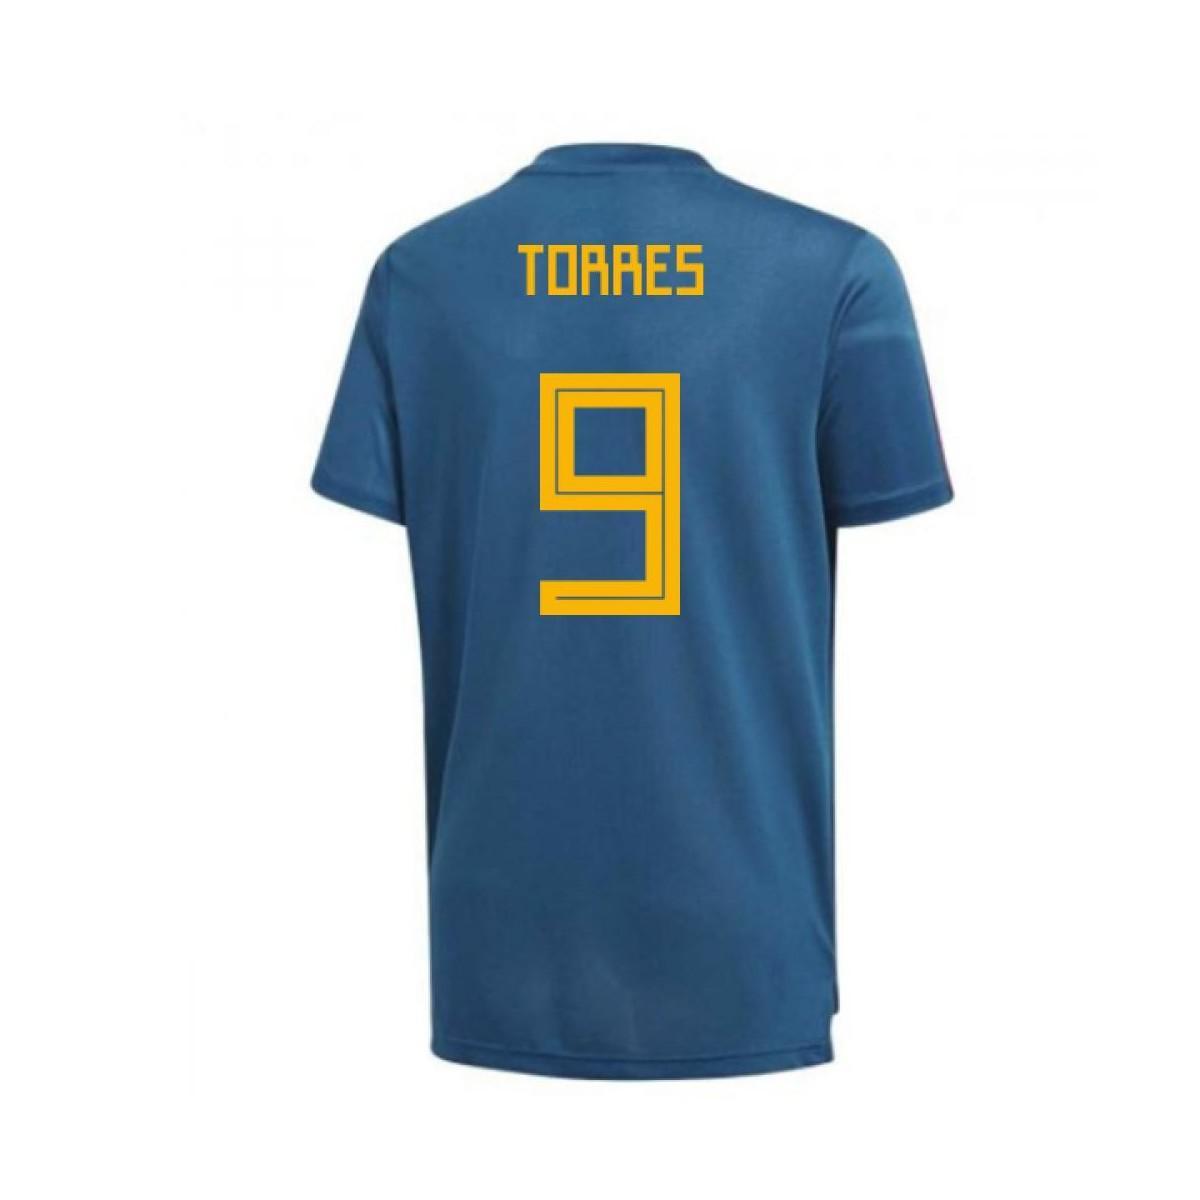 Adidas 2018-19 Spain Training Shirt (torres 9) Men s T Shirt In Blue ... 301daa228